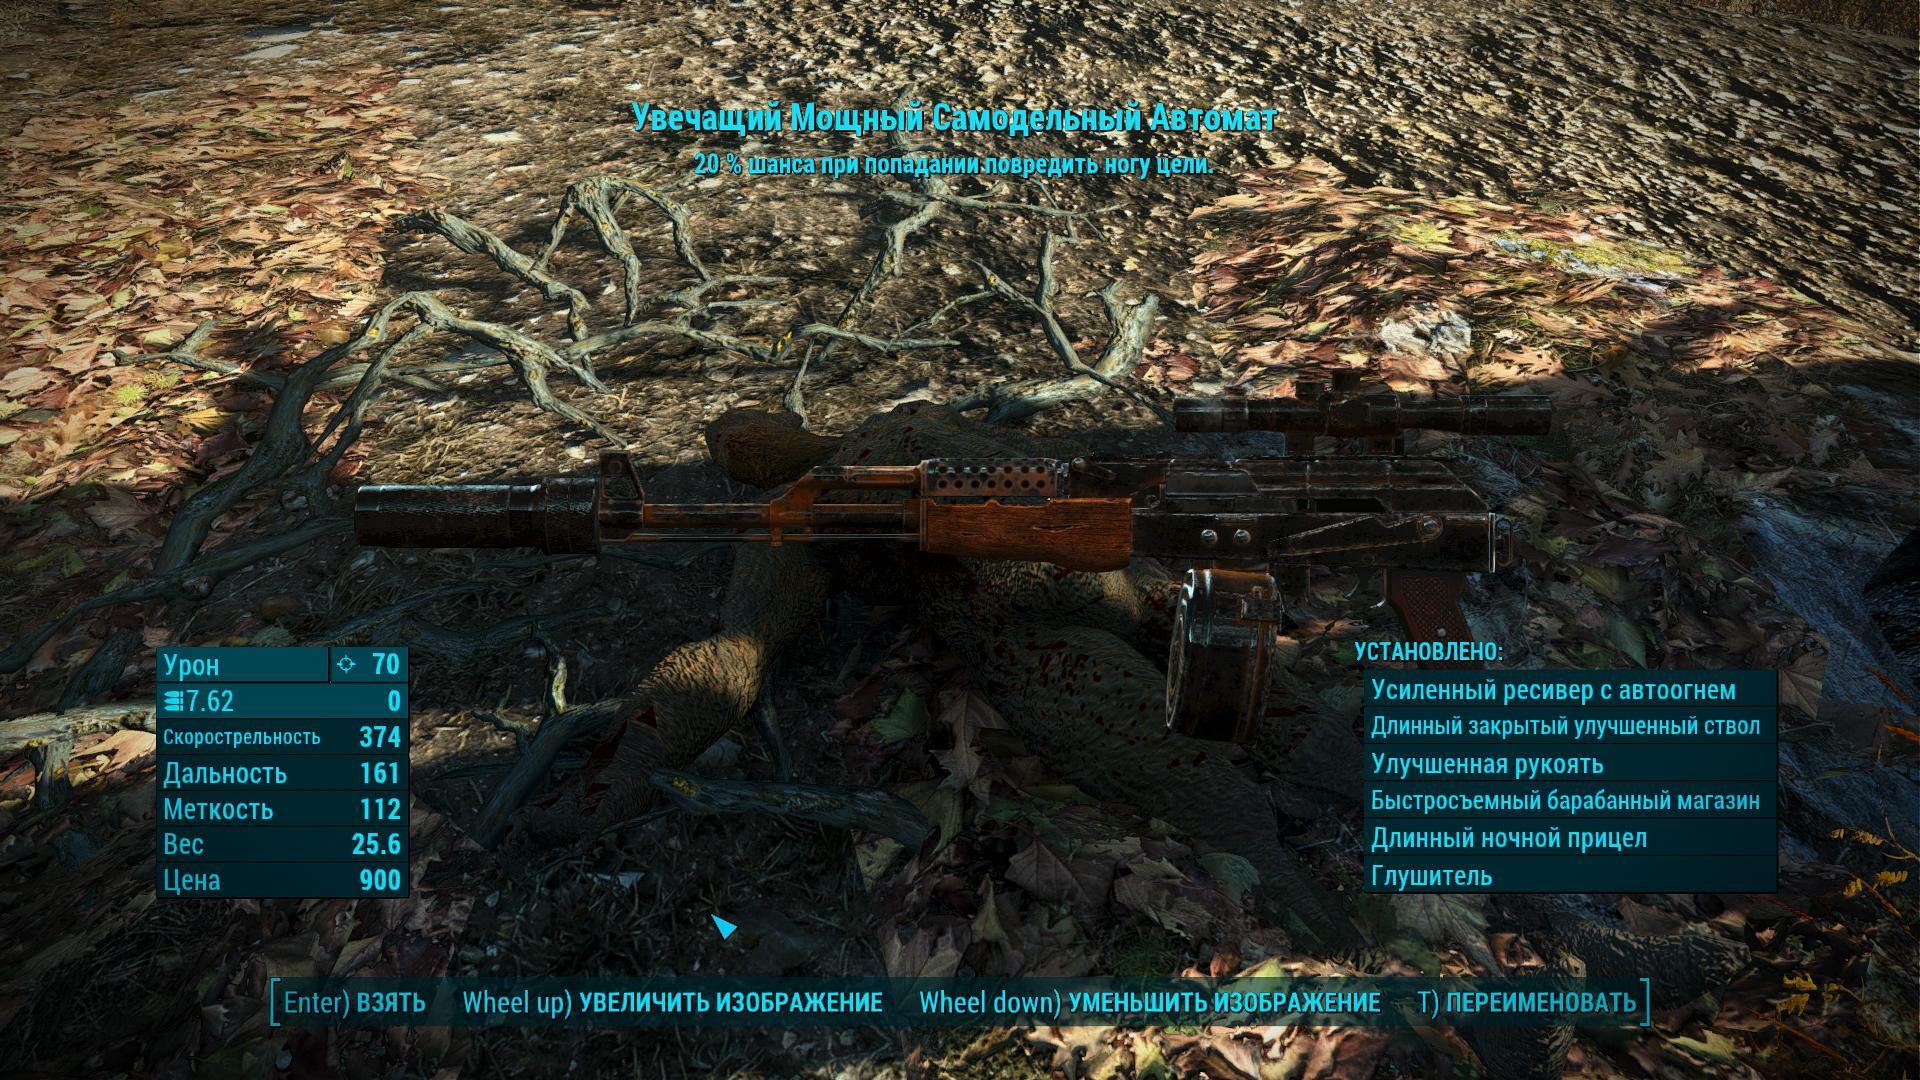 000541.Jpg - Fallout 4